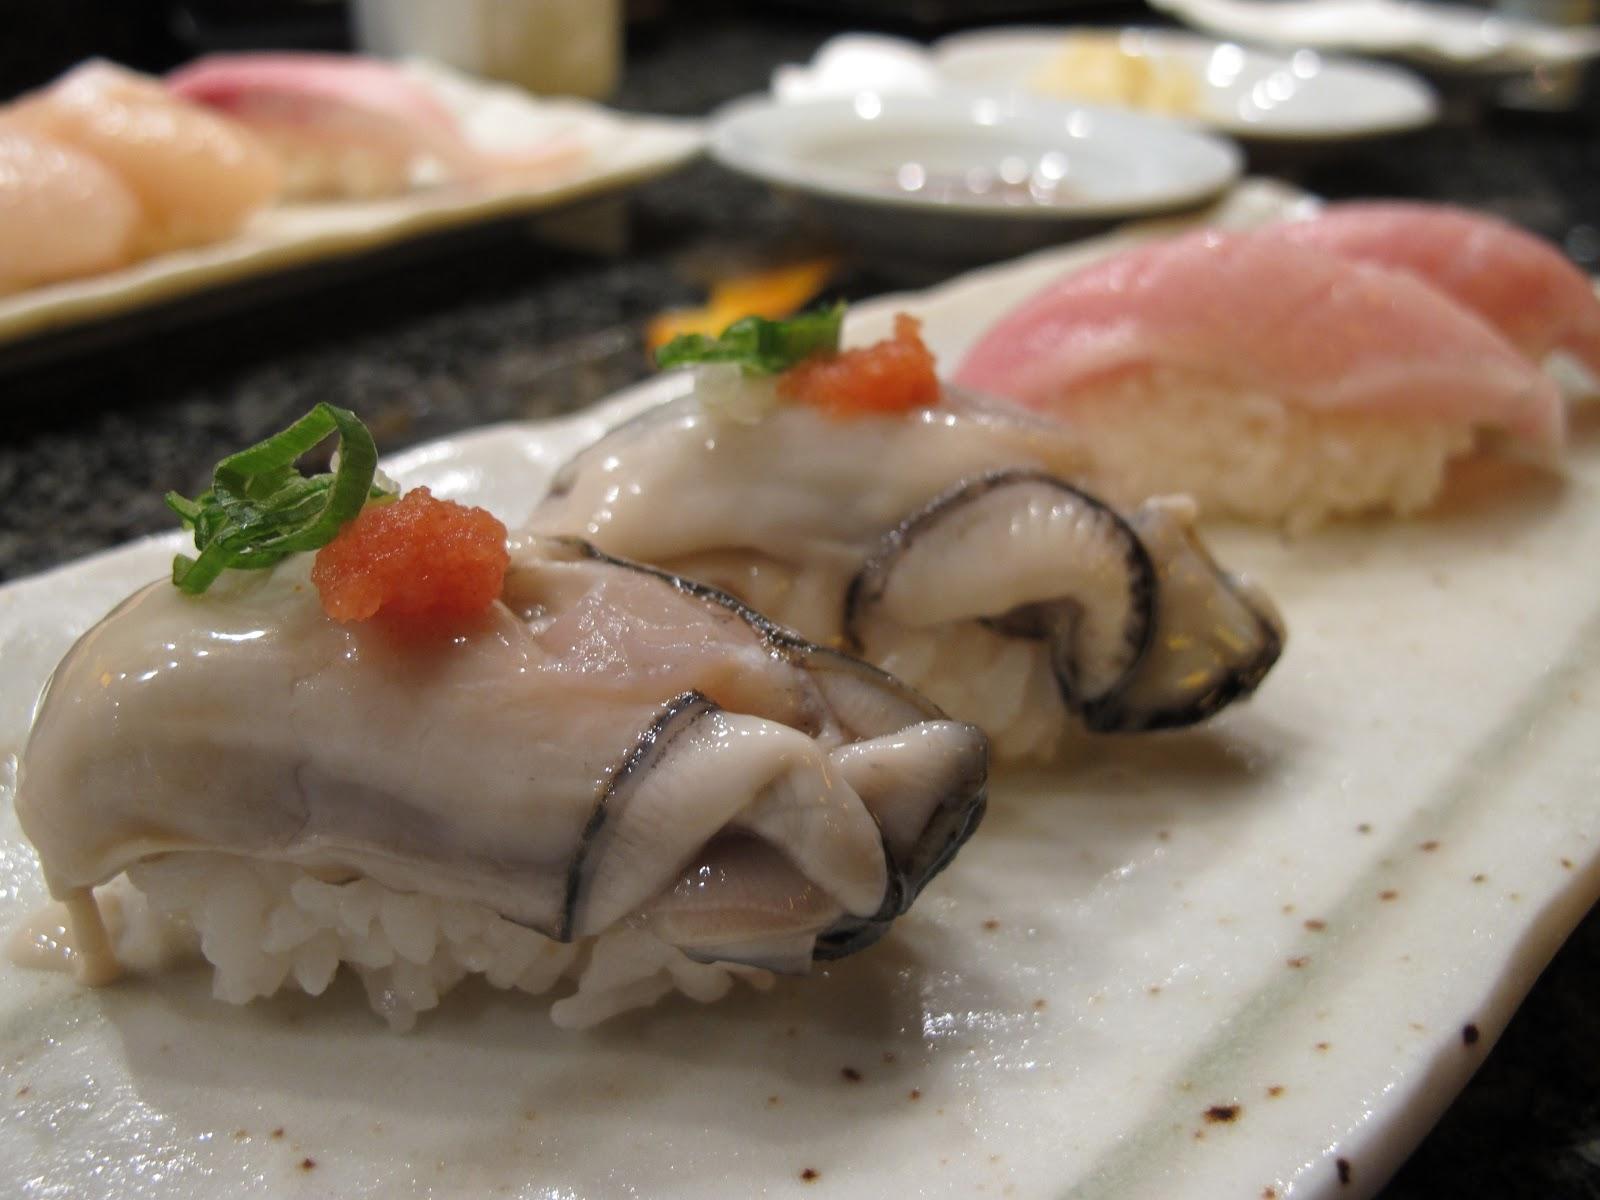 Travel with wingz japanese in hong kong for Sashimi grade fish